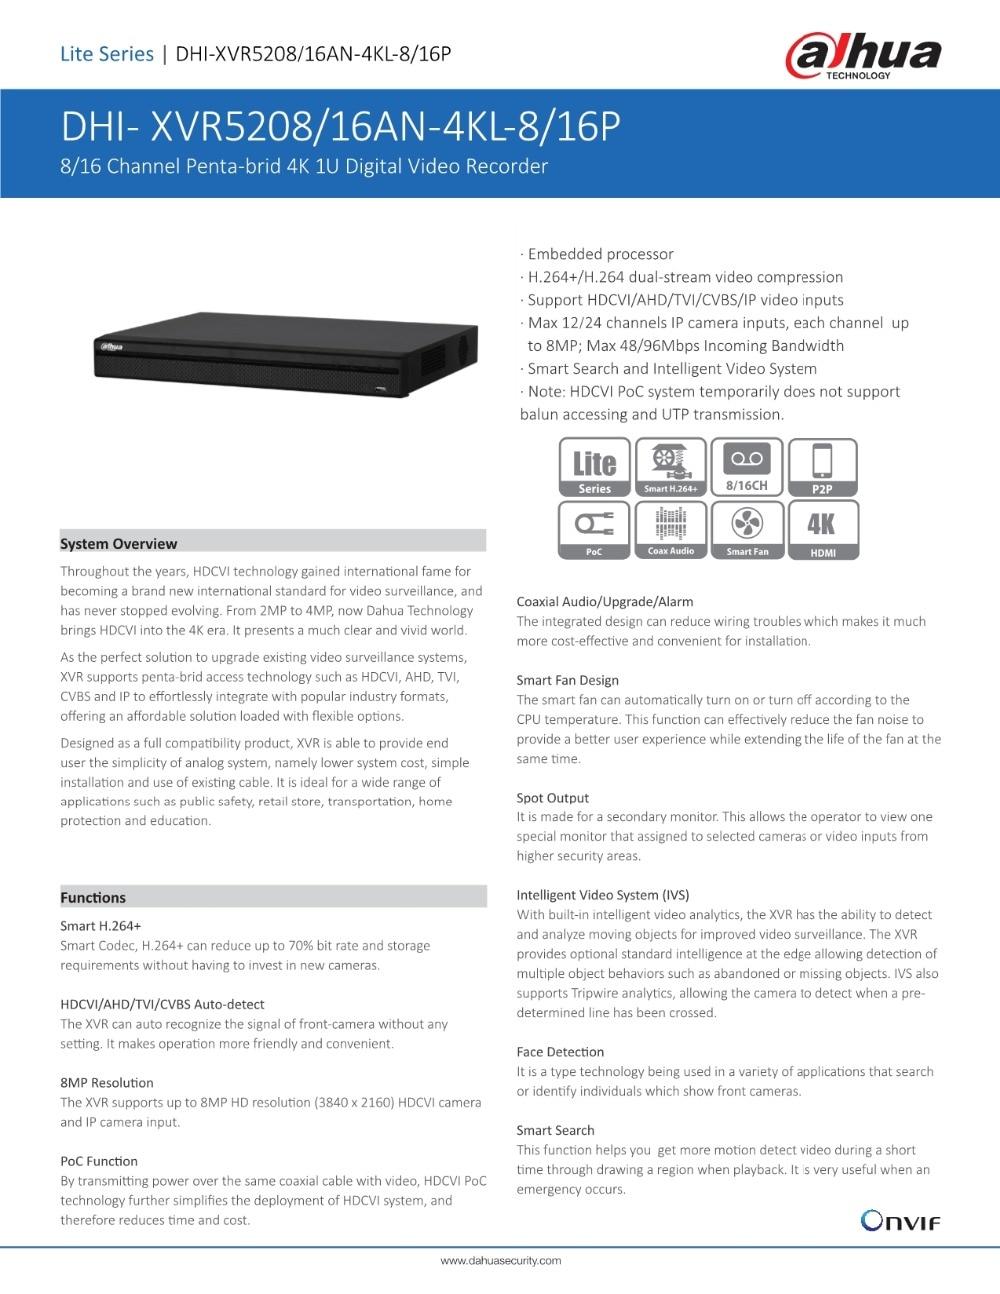 Dahua 8ch 16ch 4k Digital Video Recorder H264 Hdcvi Poc System H 264 Dvr Circuit Diagram Htb1cmw0nfusbunkhfqdq6xfhvxa8